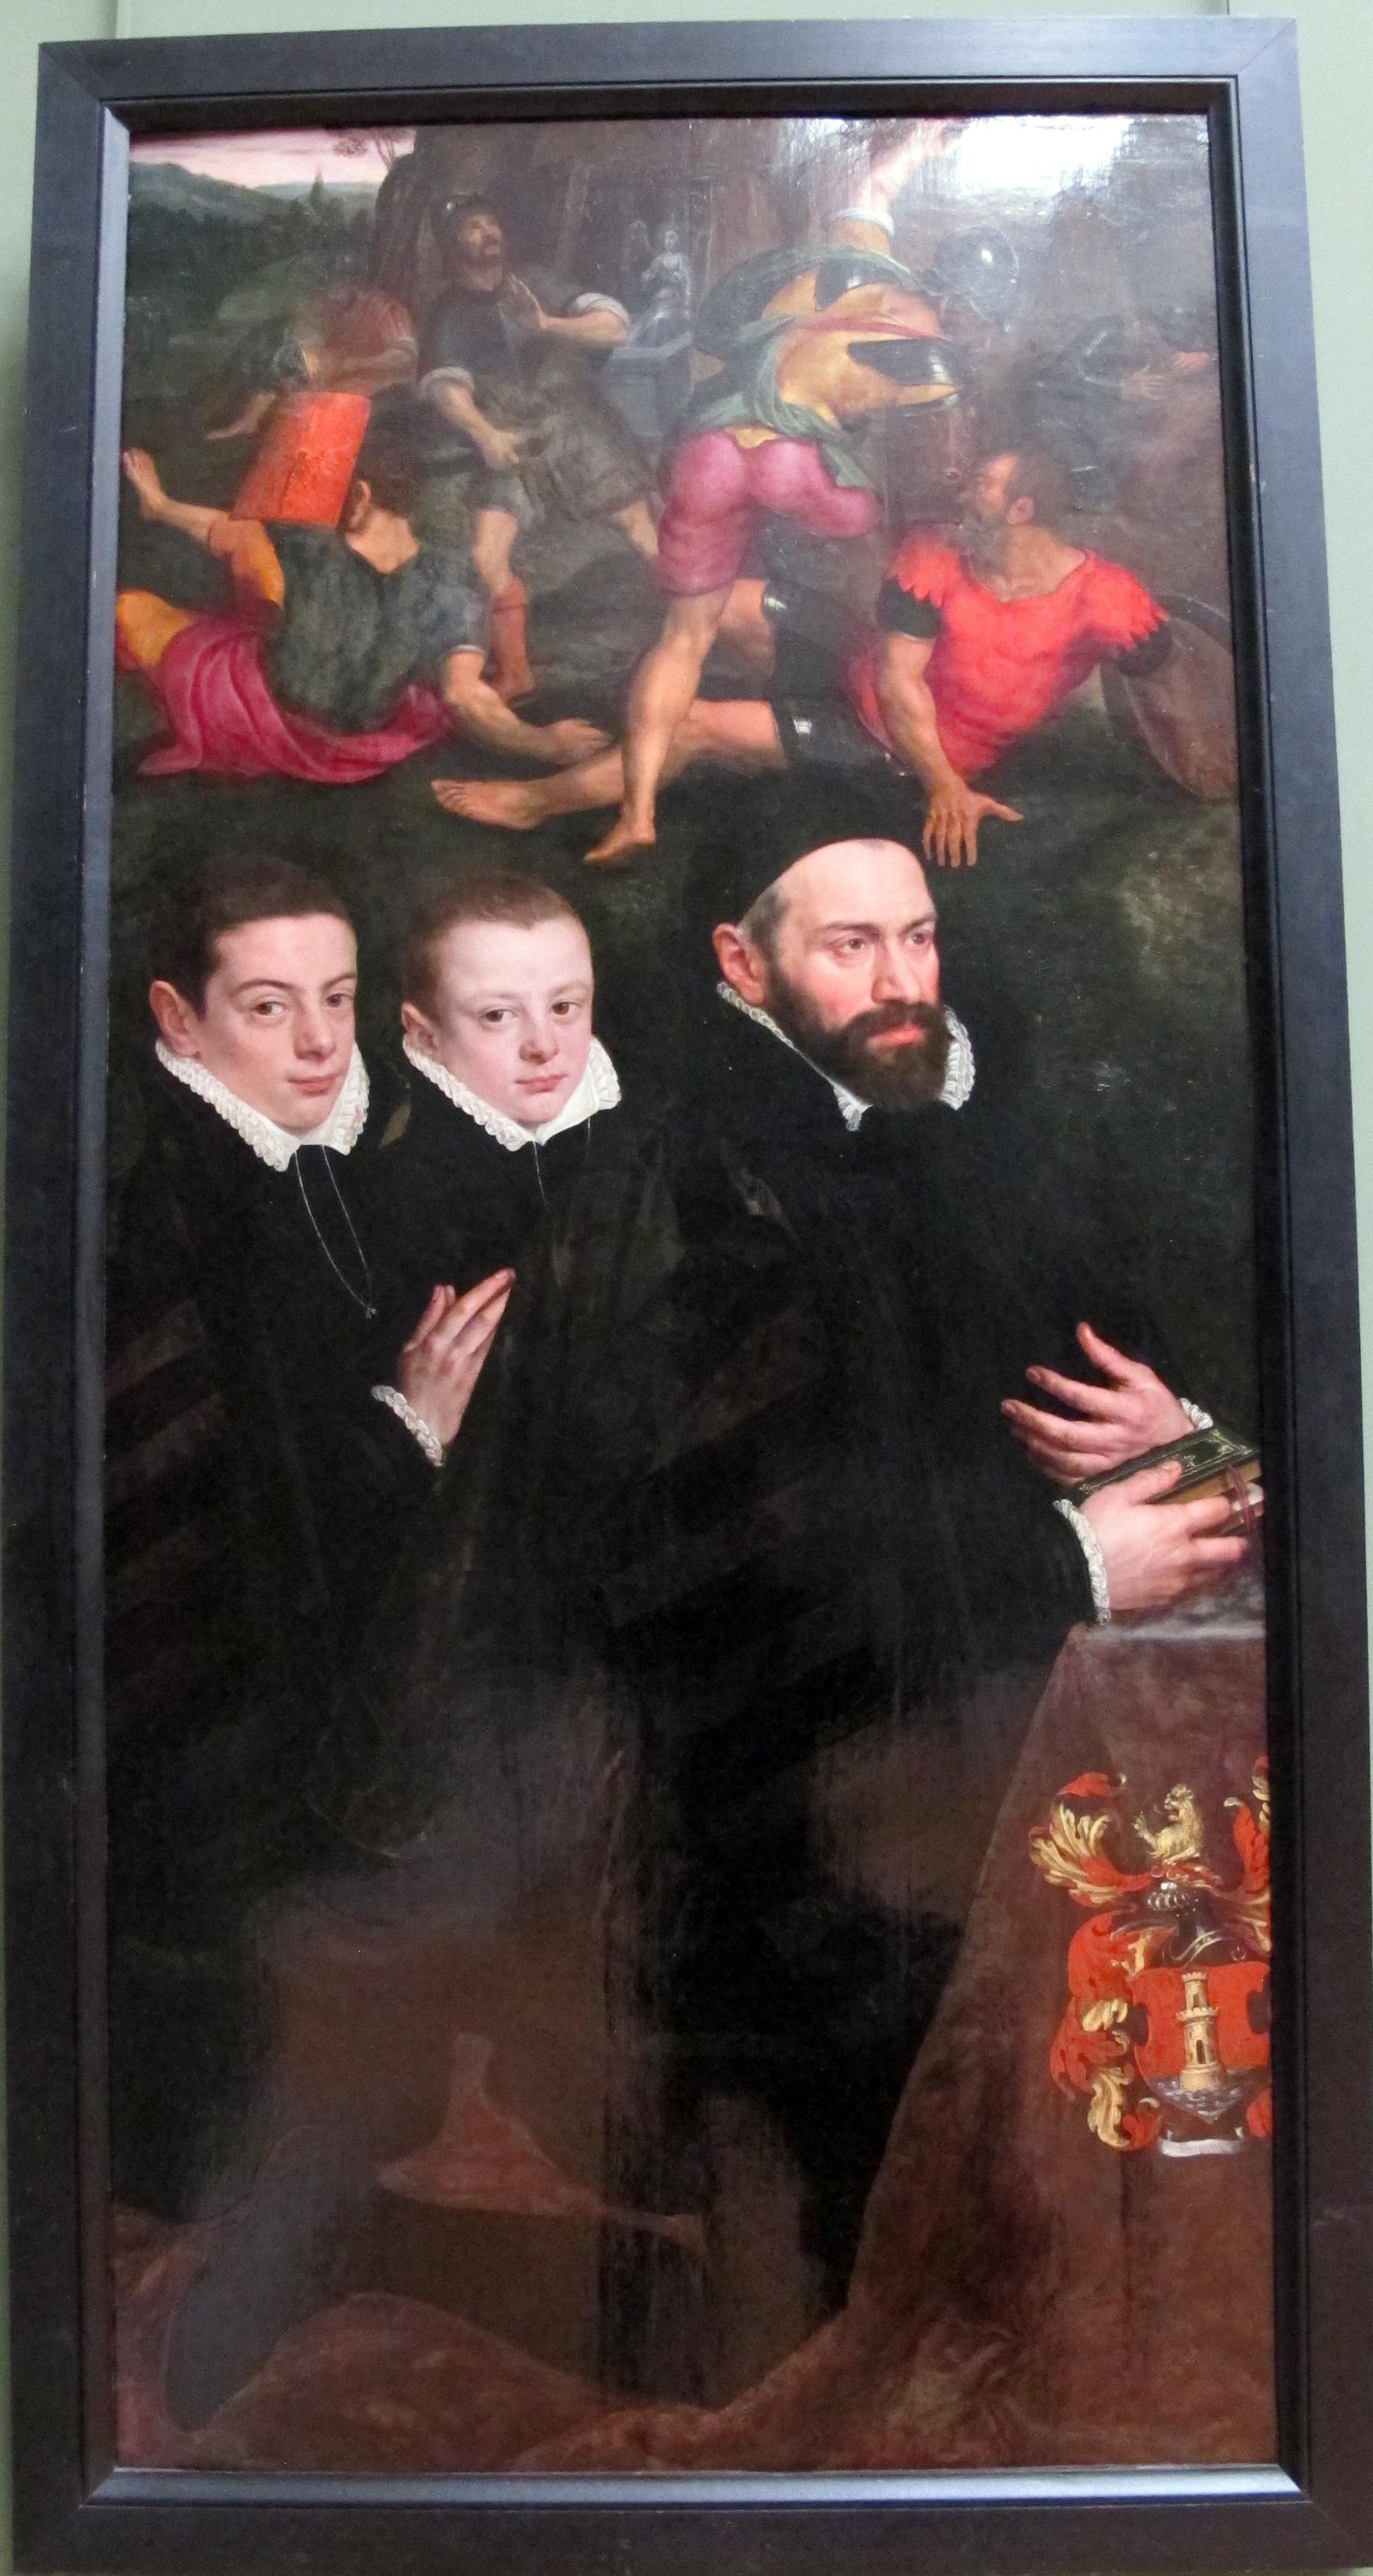 Antonio del Rio and his two sons